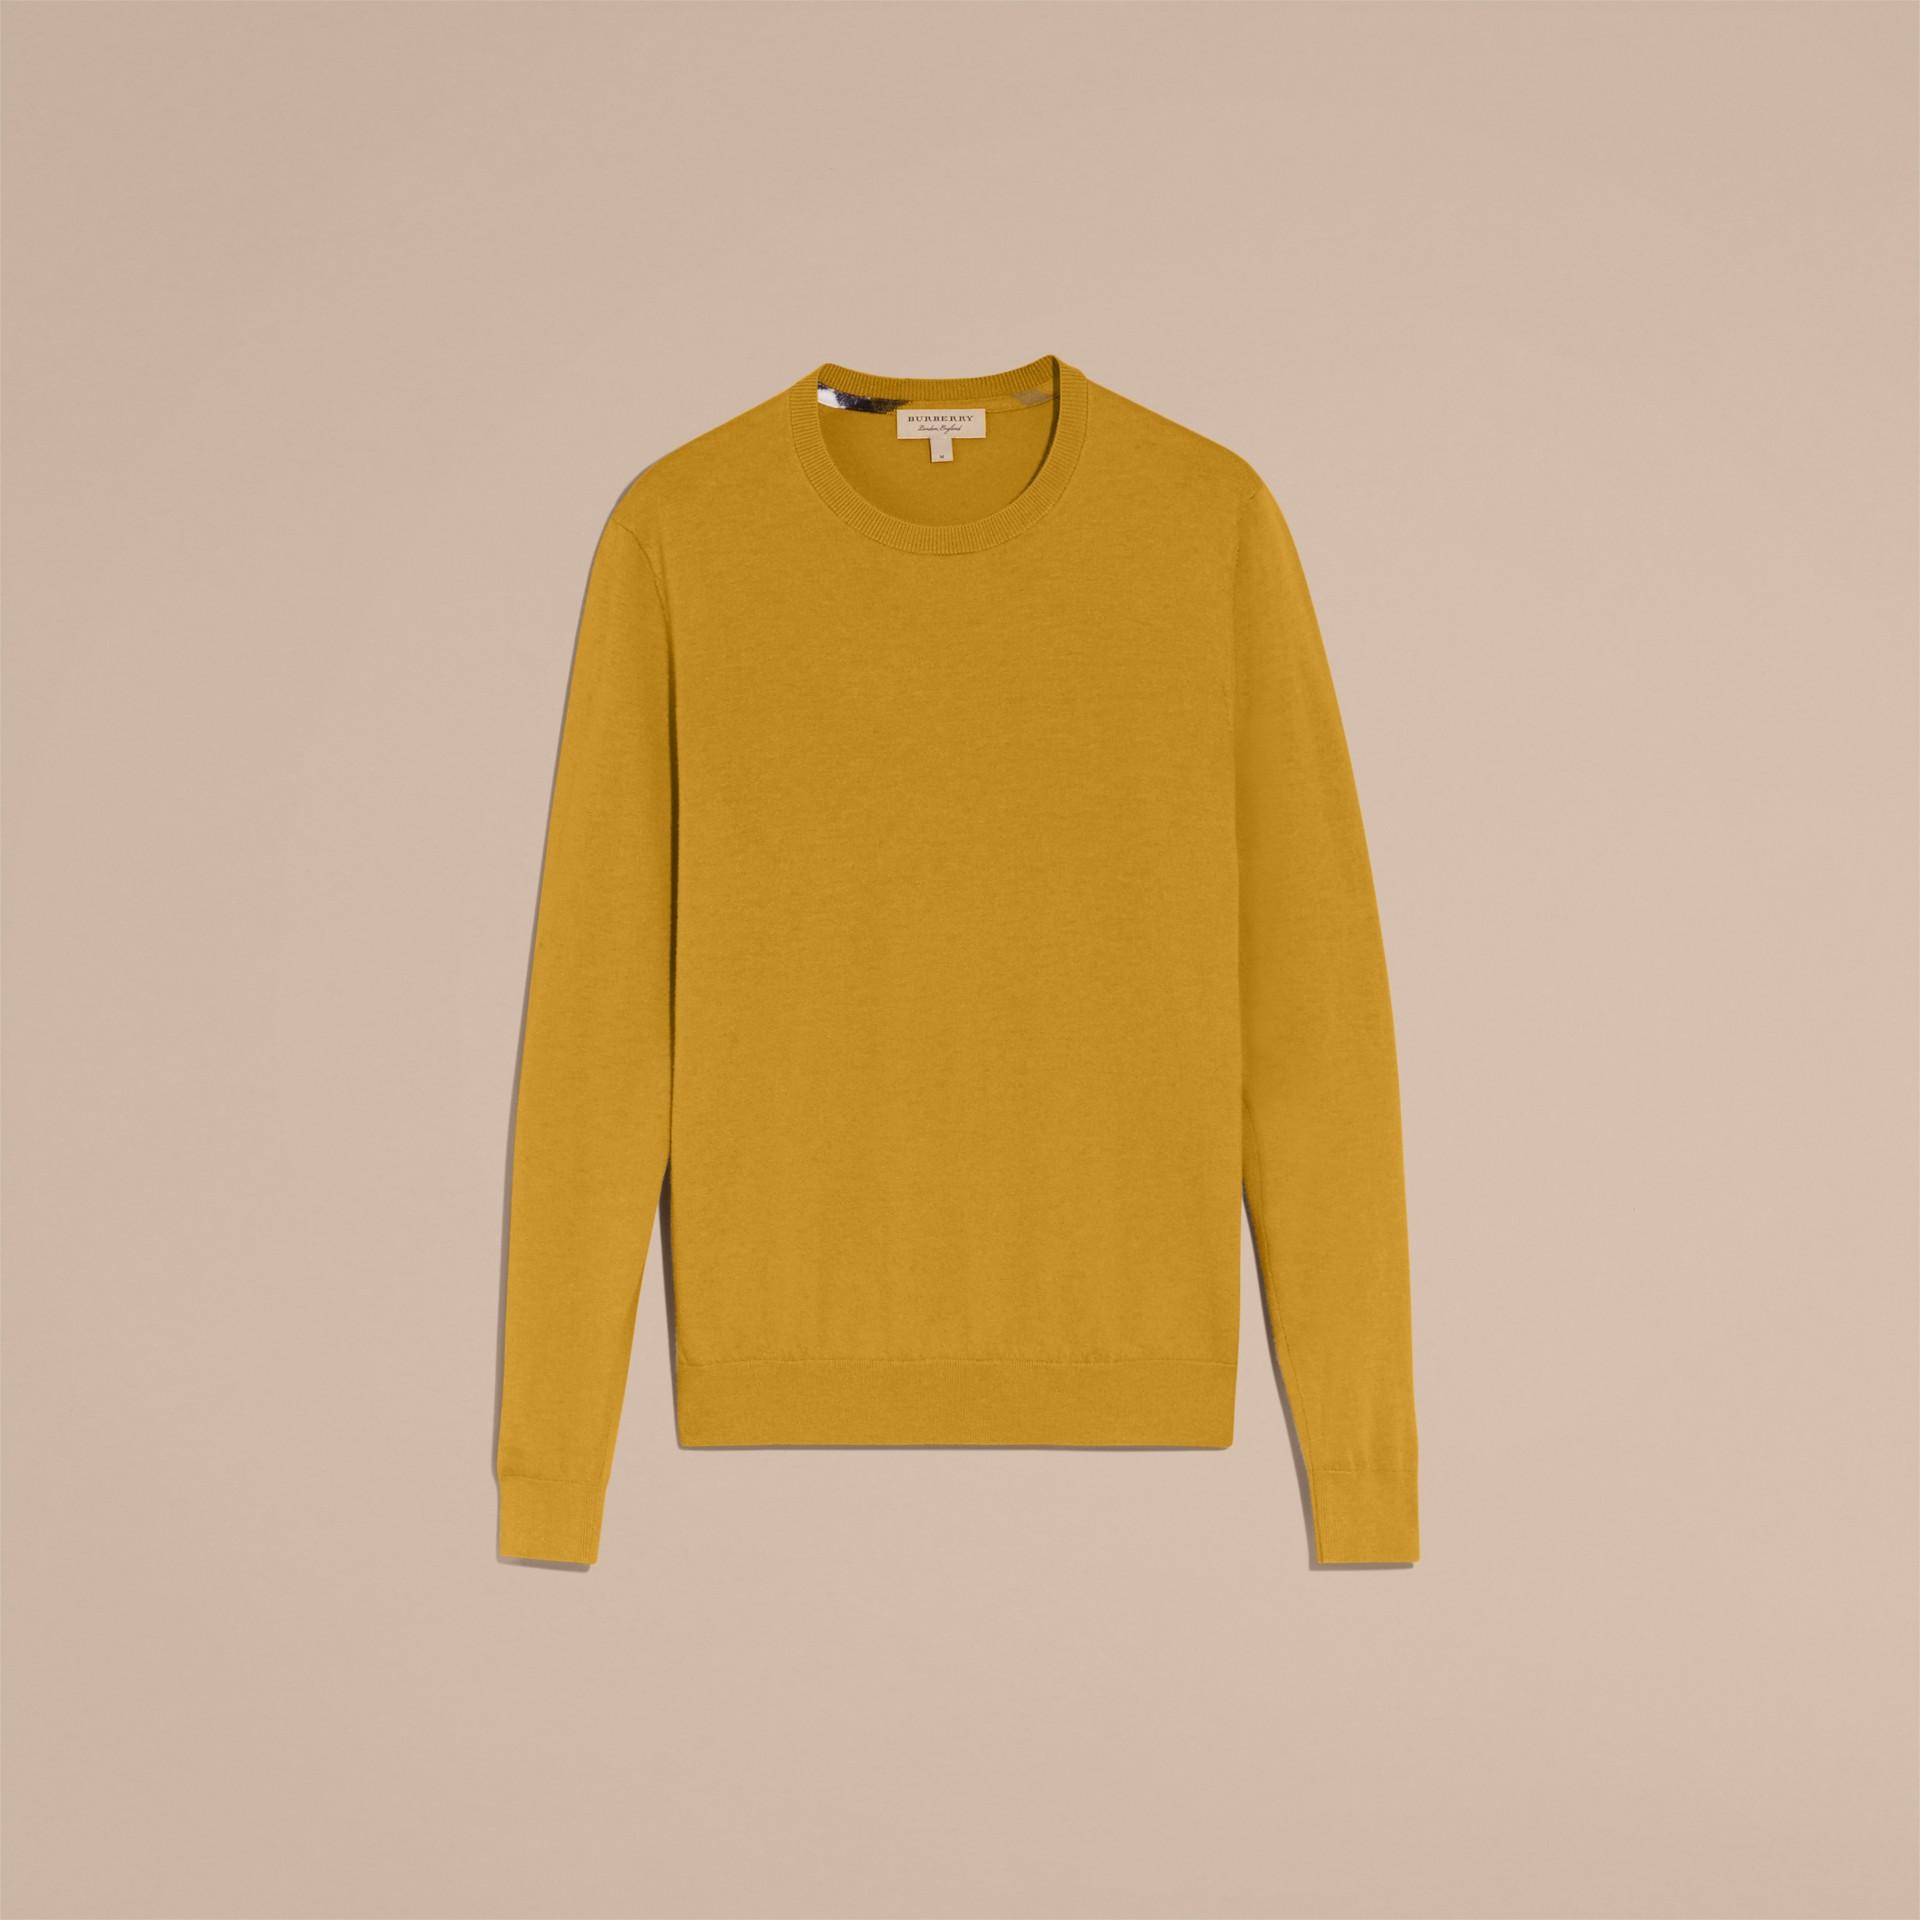 Lightweight Crew Neck Cashmere Sweater with Check Trim Cornflower Yellow - gallery image 4